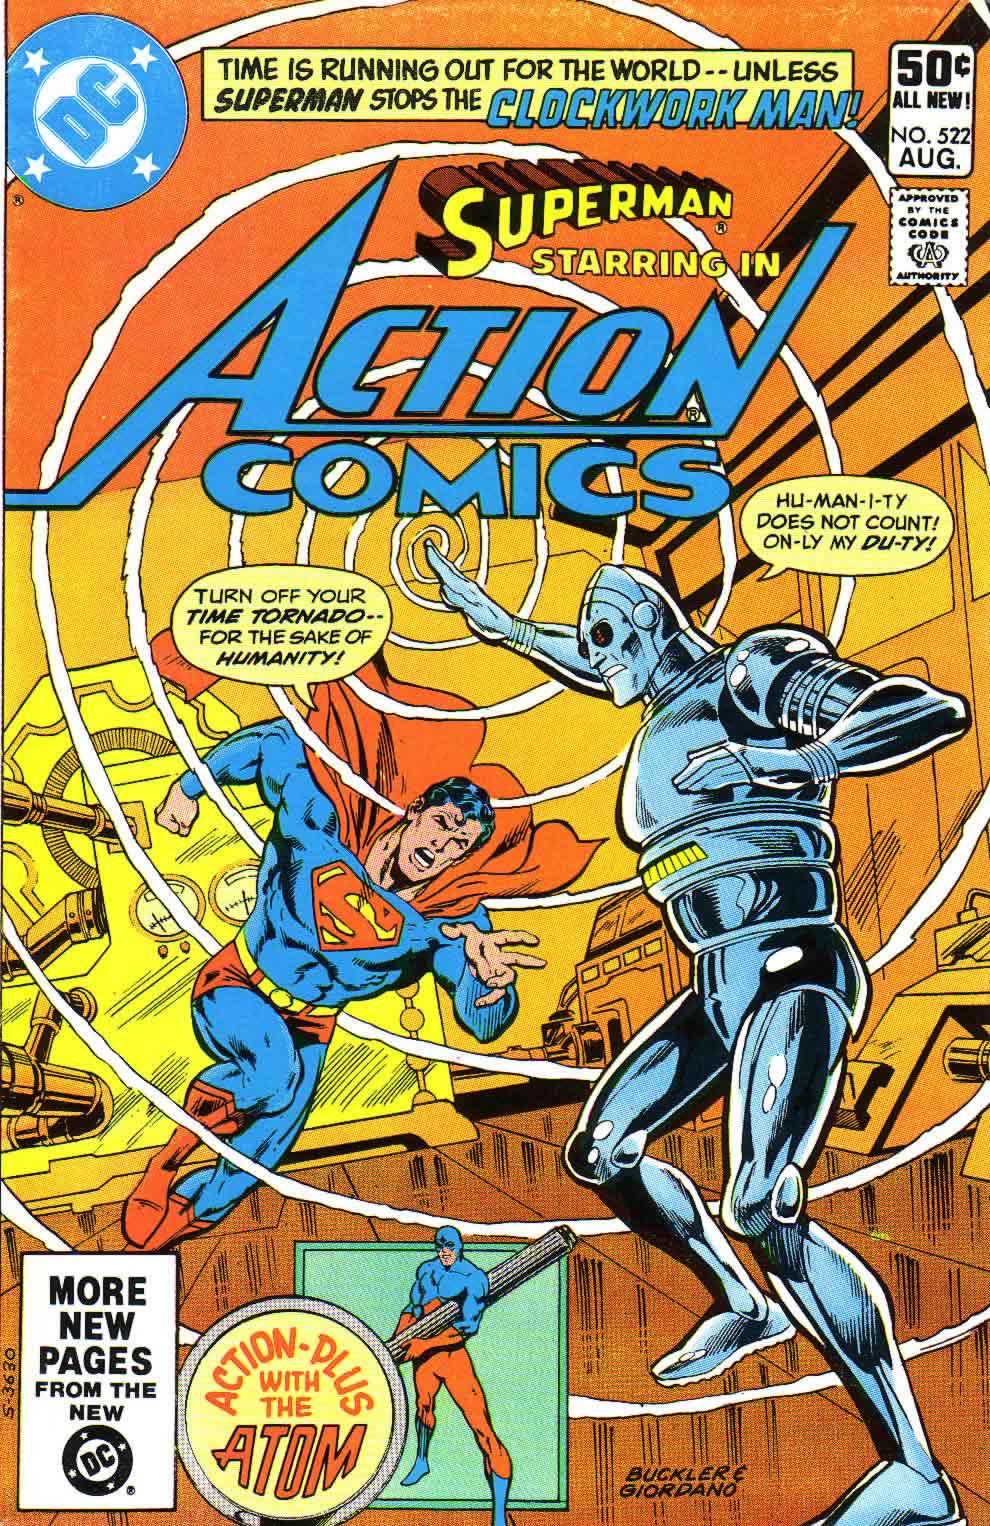 Action Comics (1938) 522 Page 1